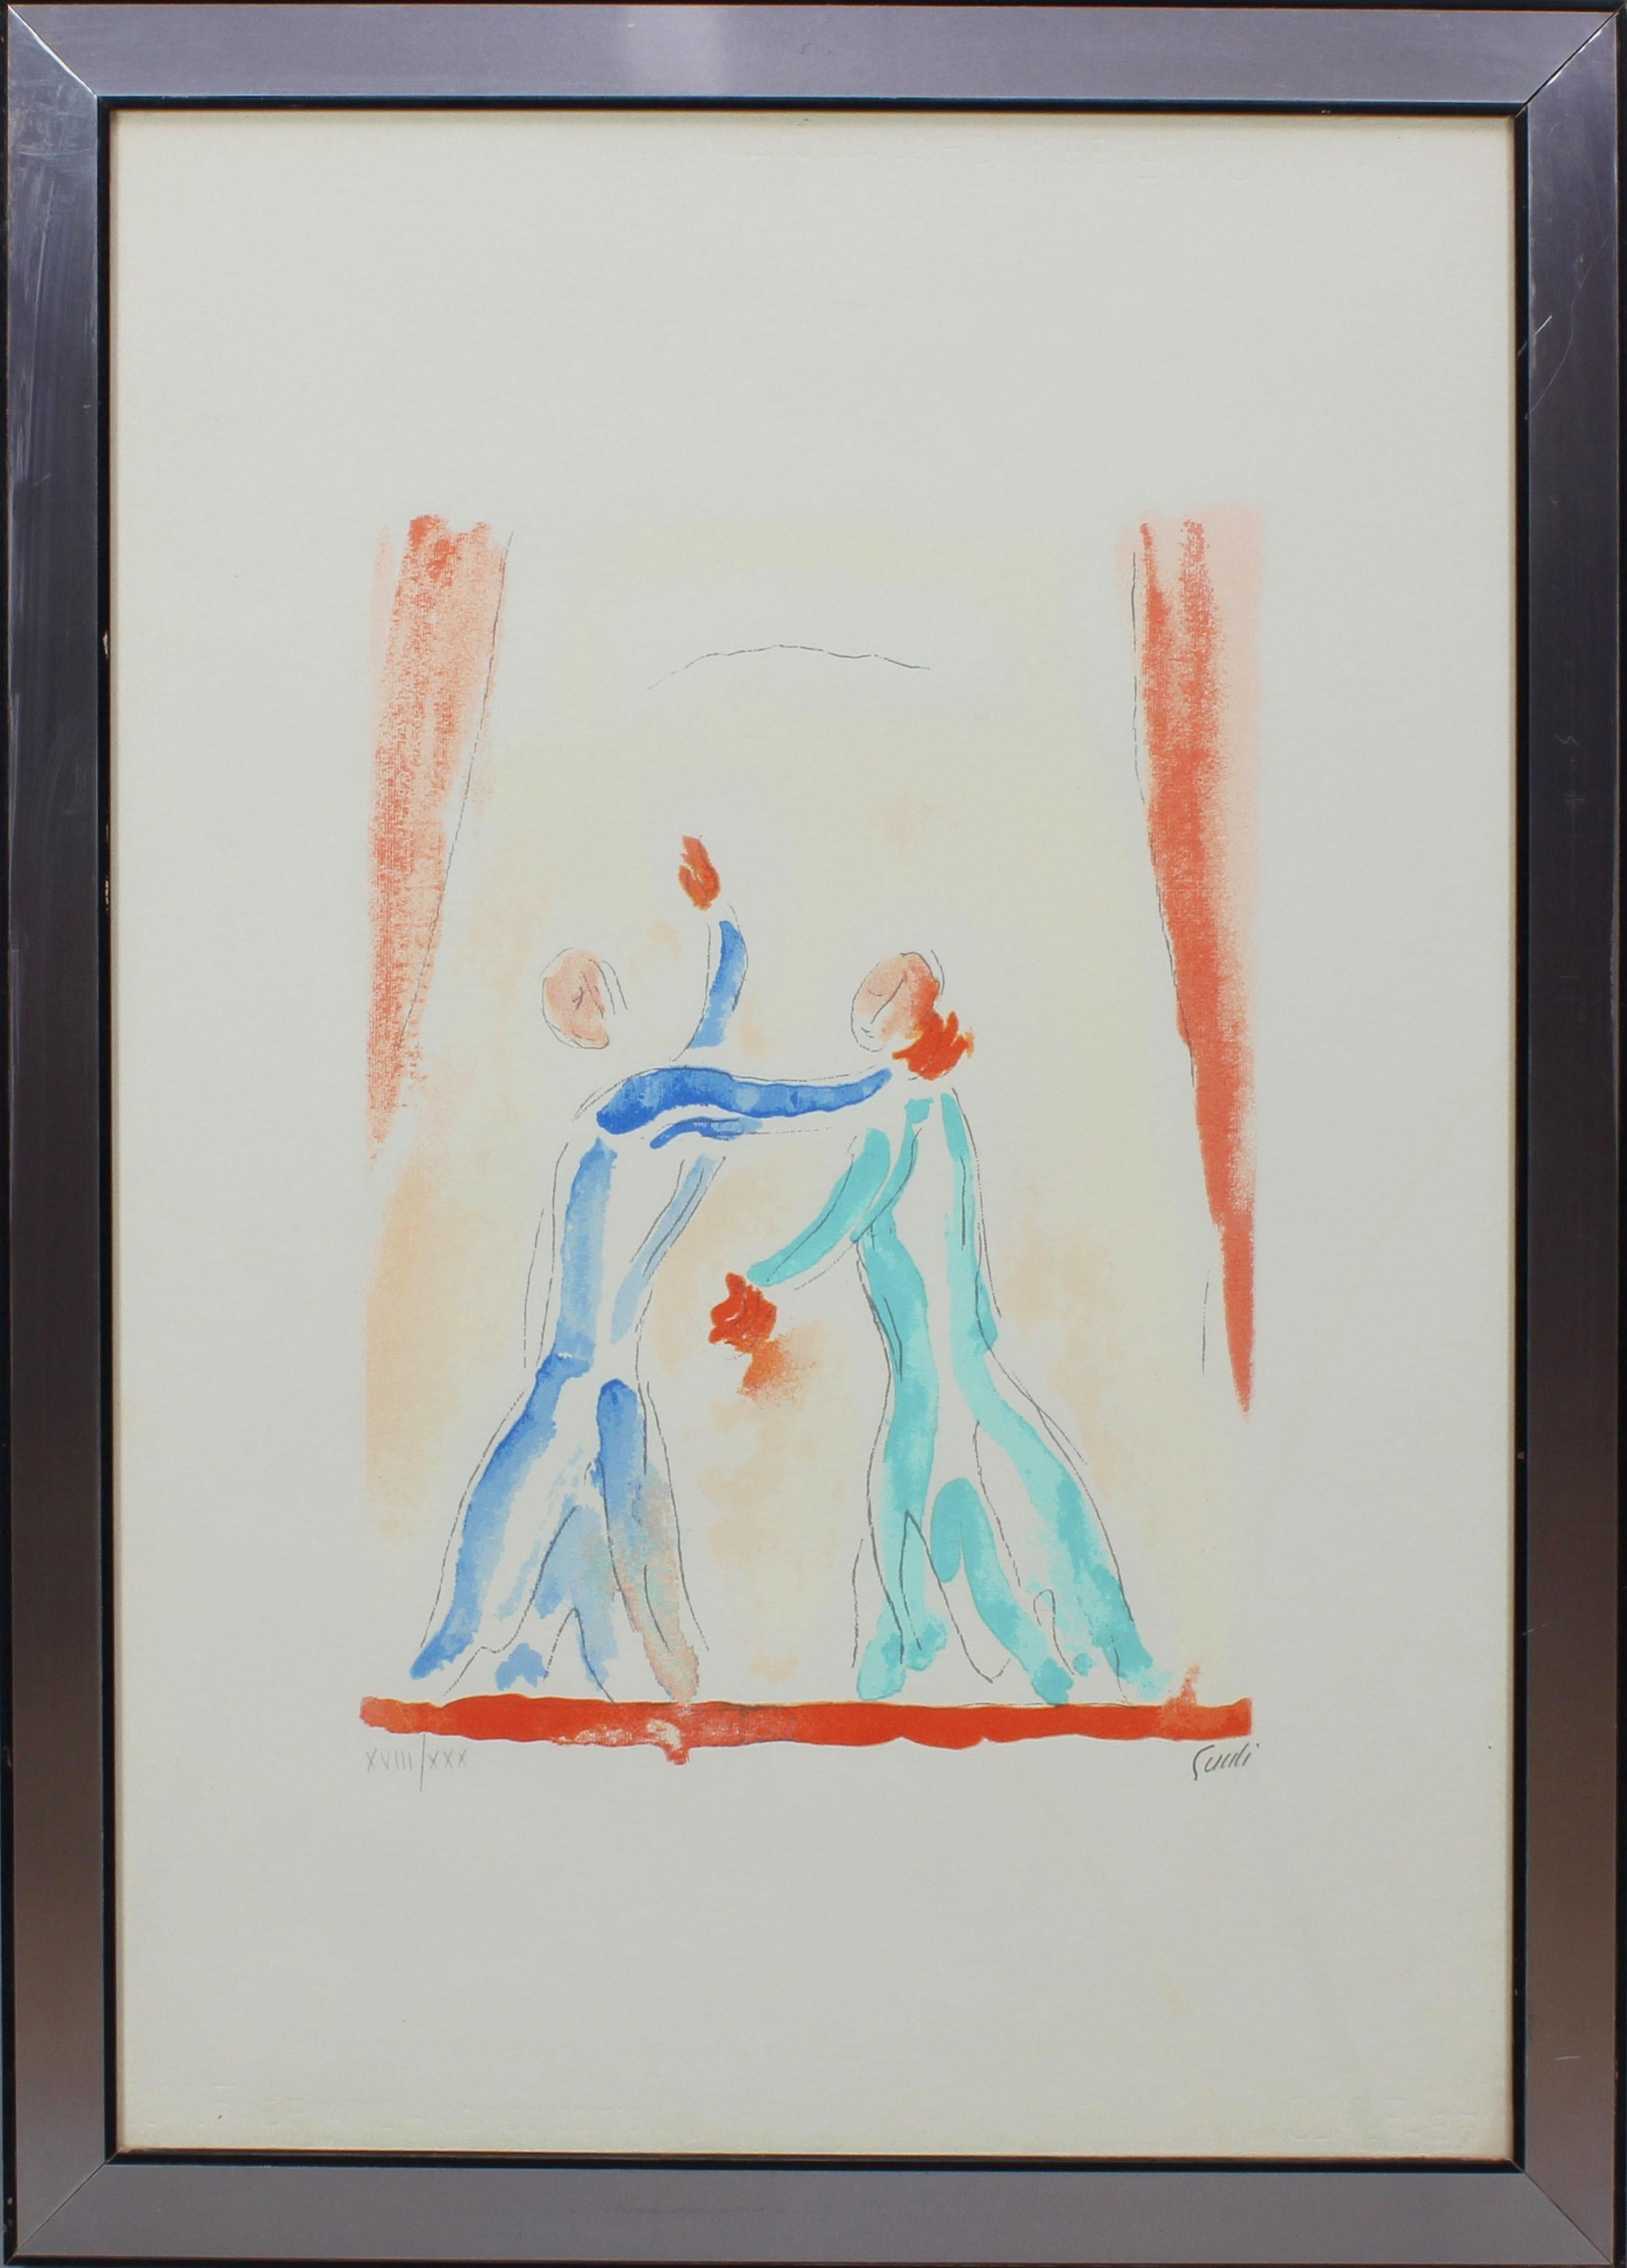 Lot 13 - Ballerini, grafica XVIII/XXX, firmata Guidi, cm. 50x70